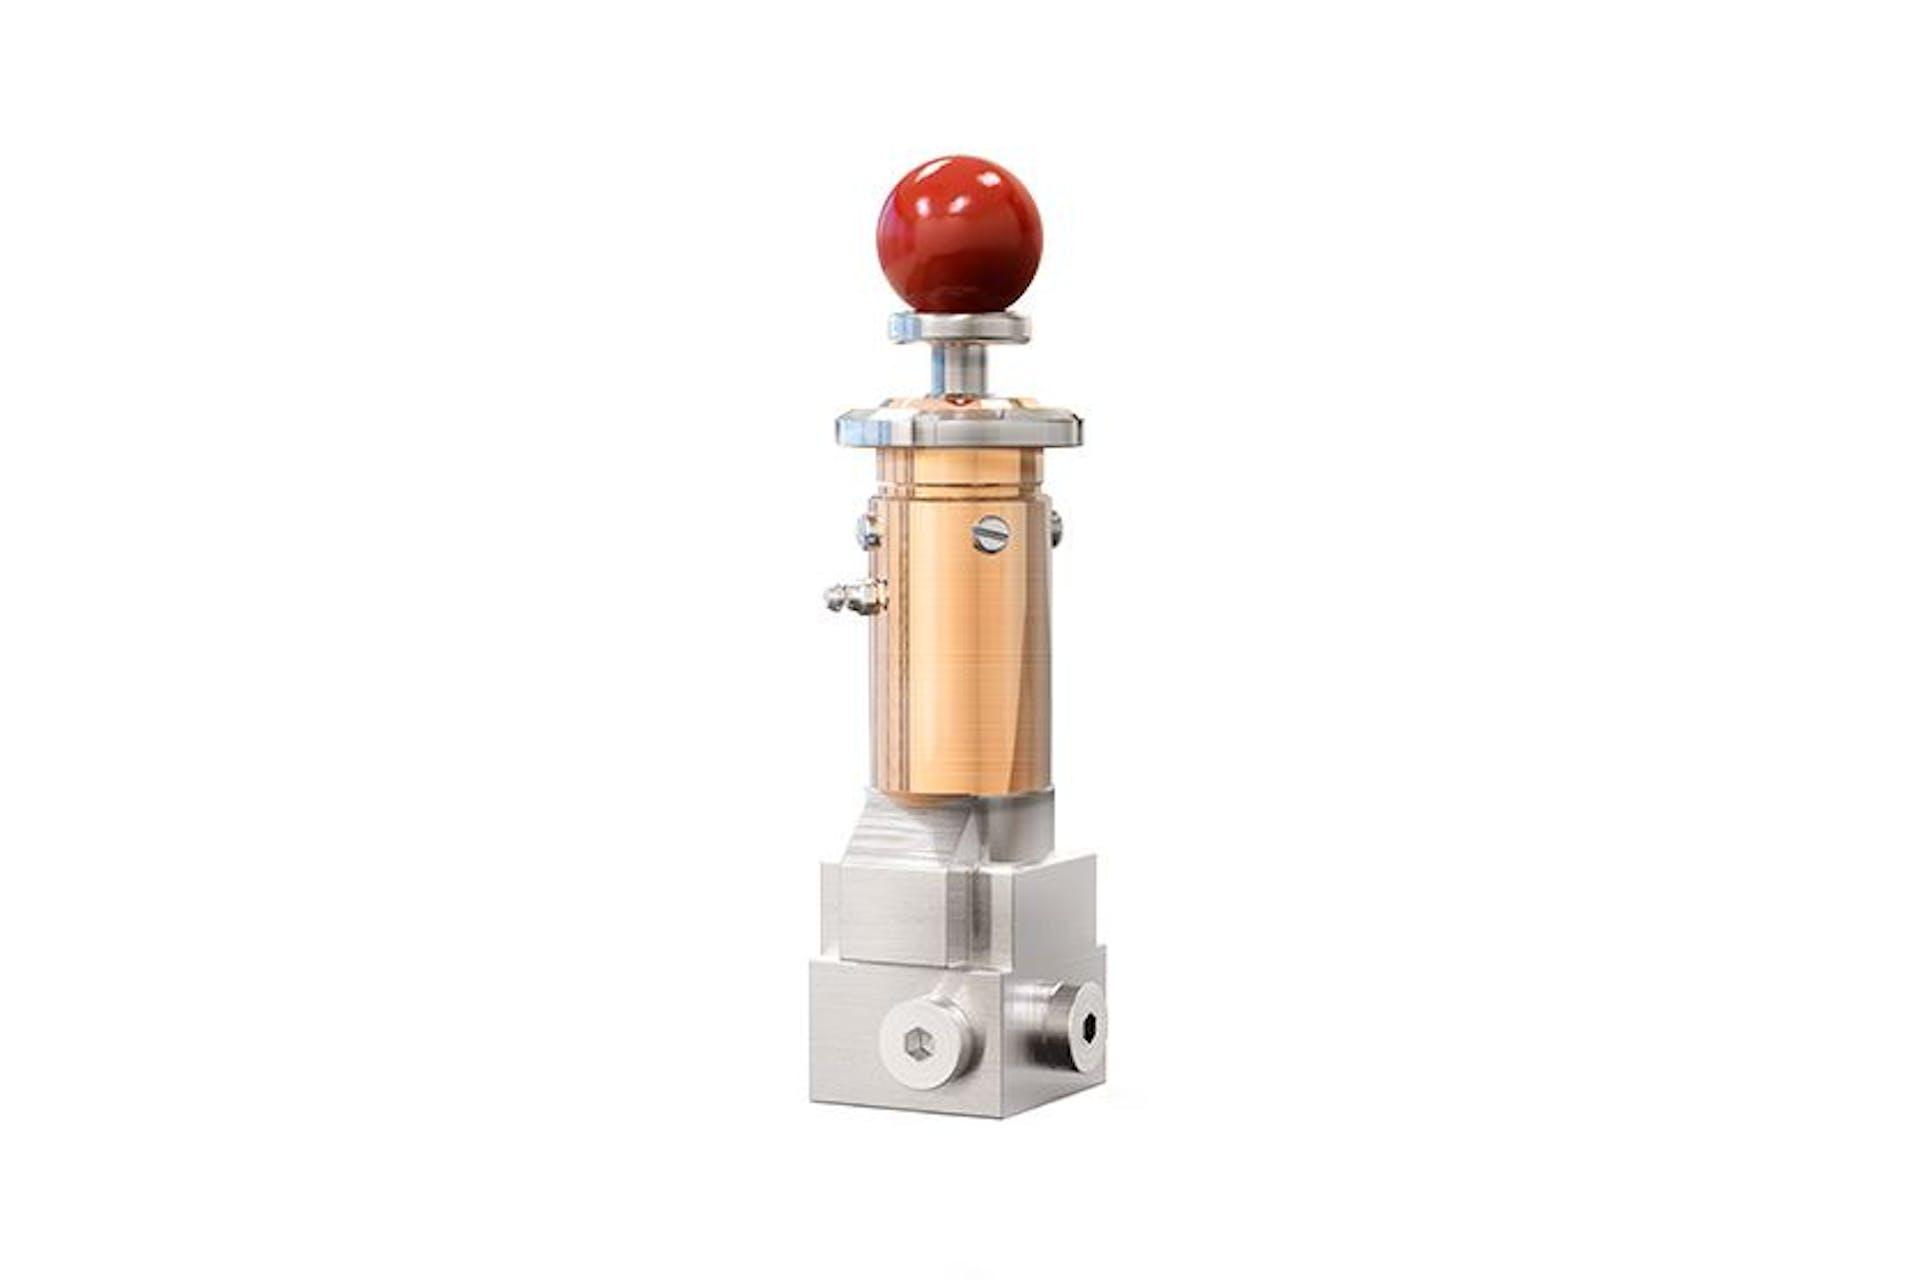 hydraulic-emergency-stop-valve-1